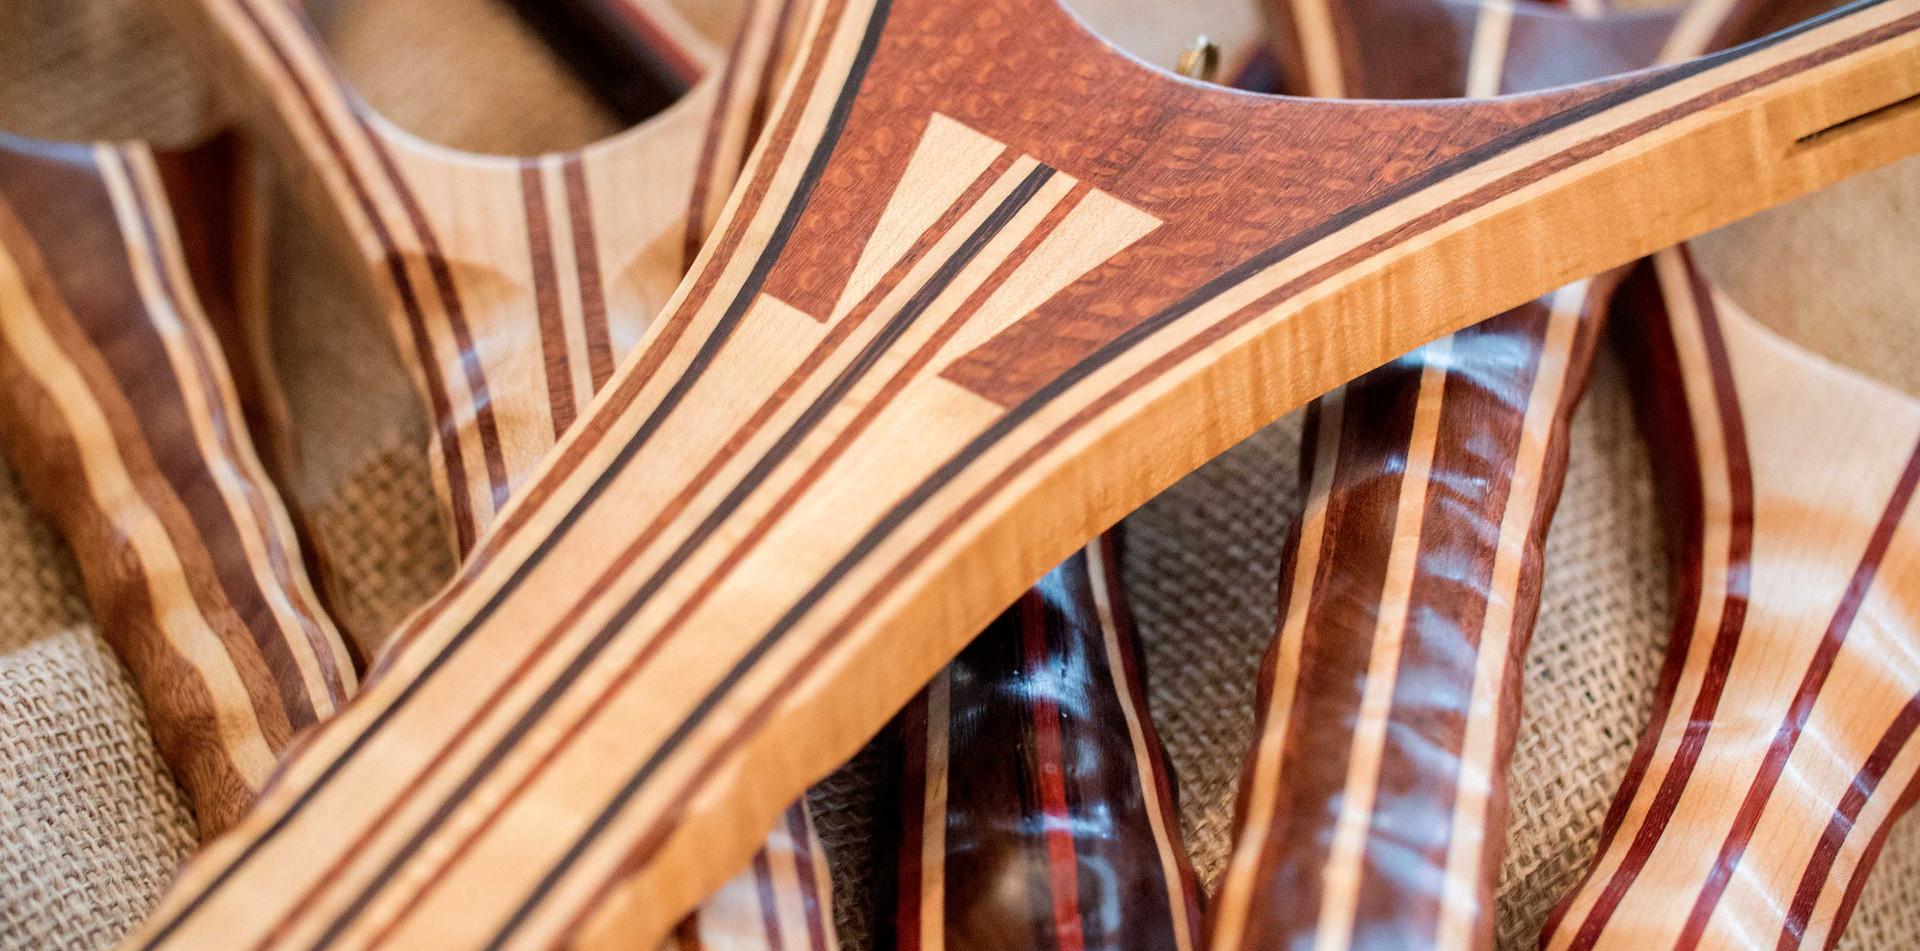 Adventure & Outdoors Winner: Wooden Landing Nets by Heart Wood Trade